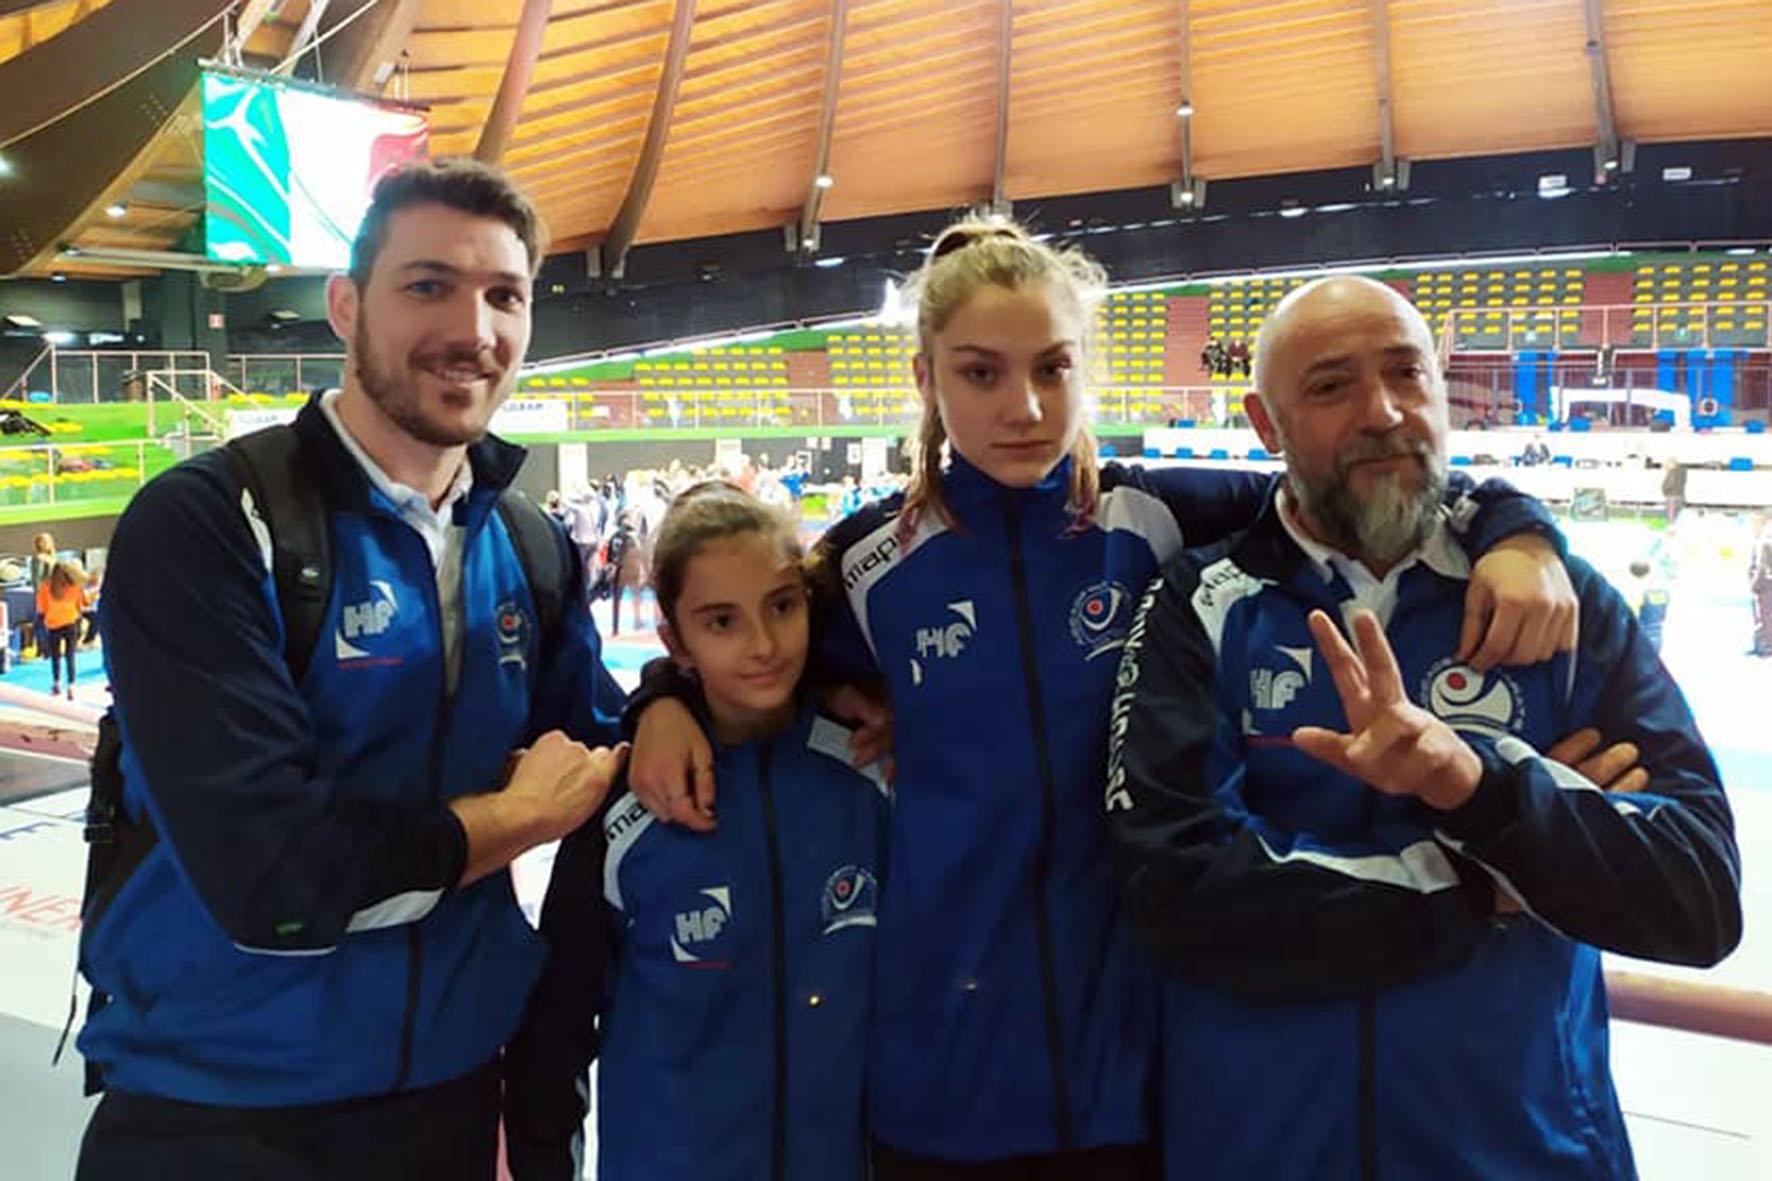 Accademia Karate Casentino - Campionati Italiani Esordienti